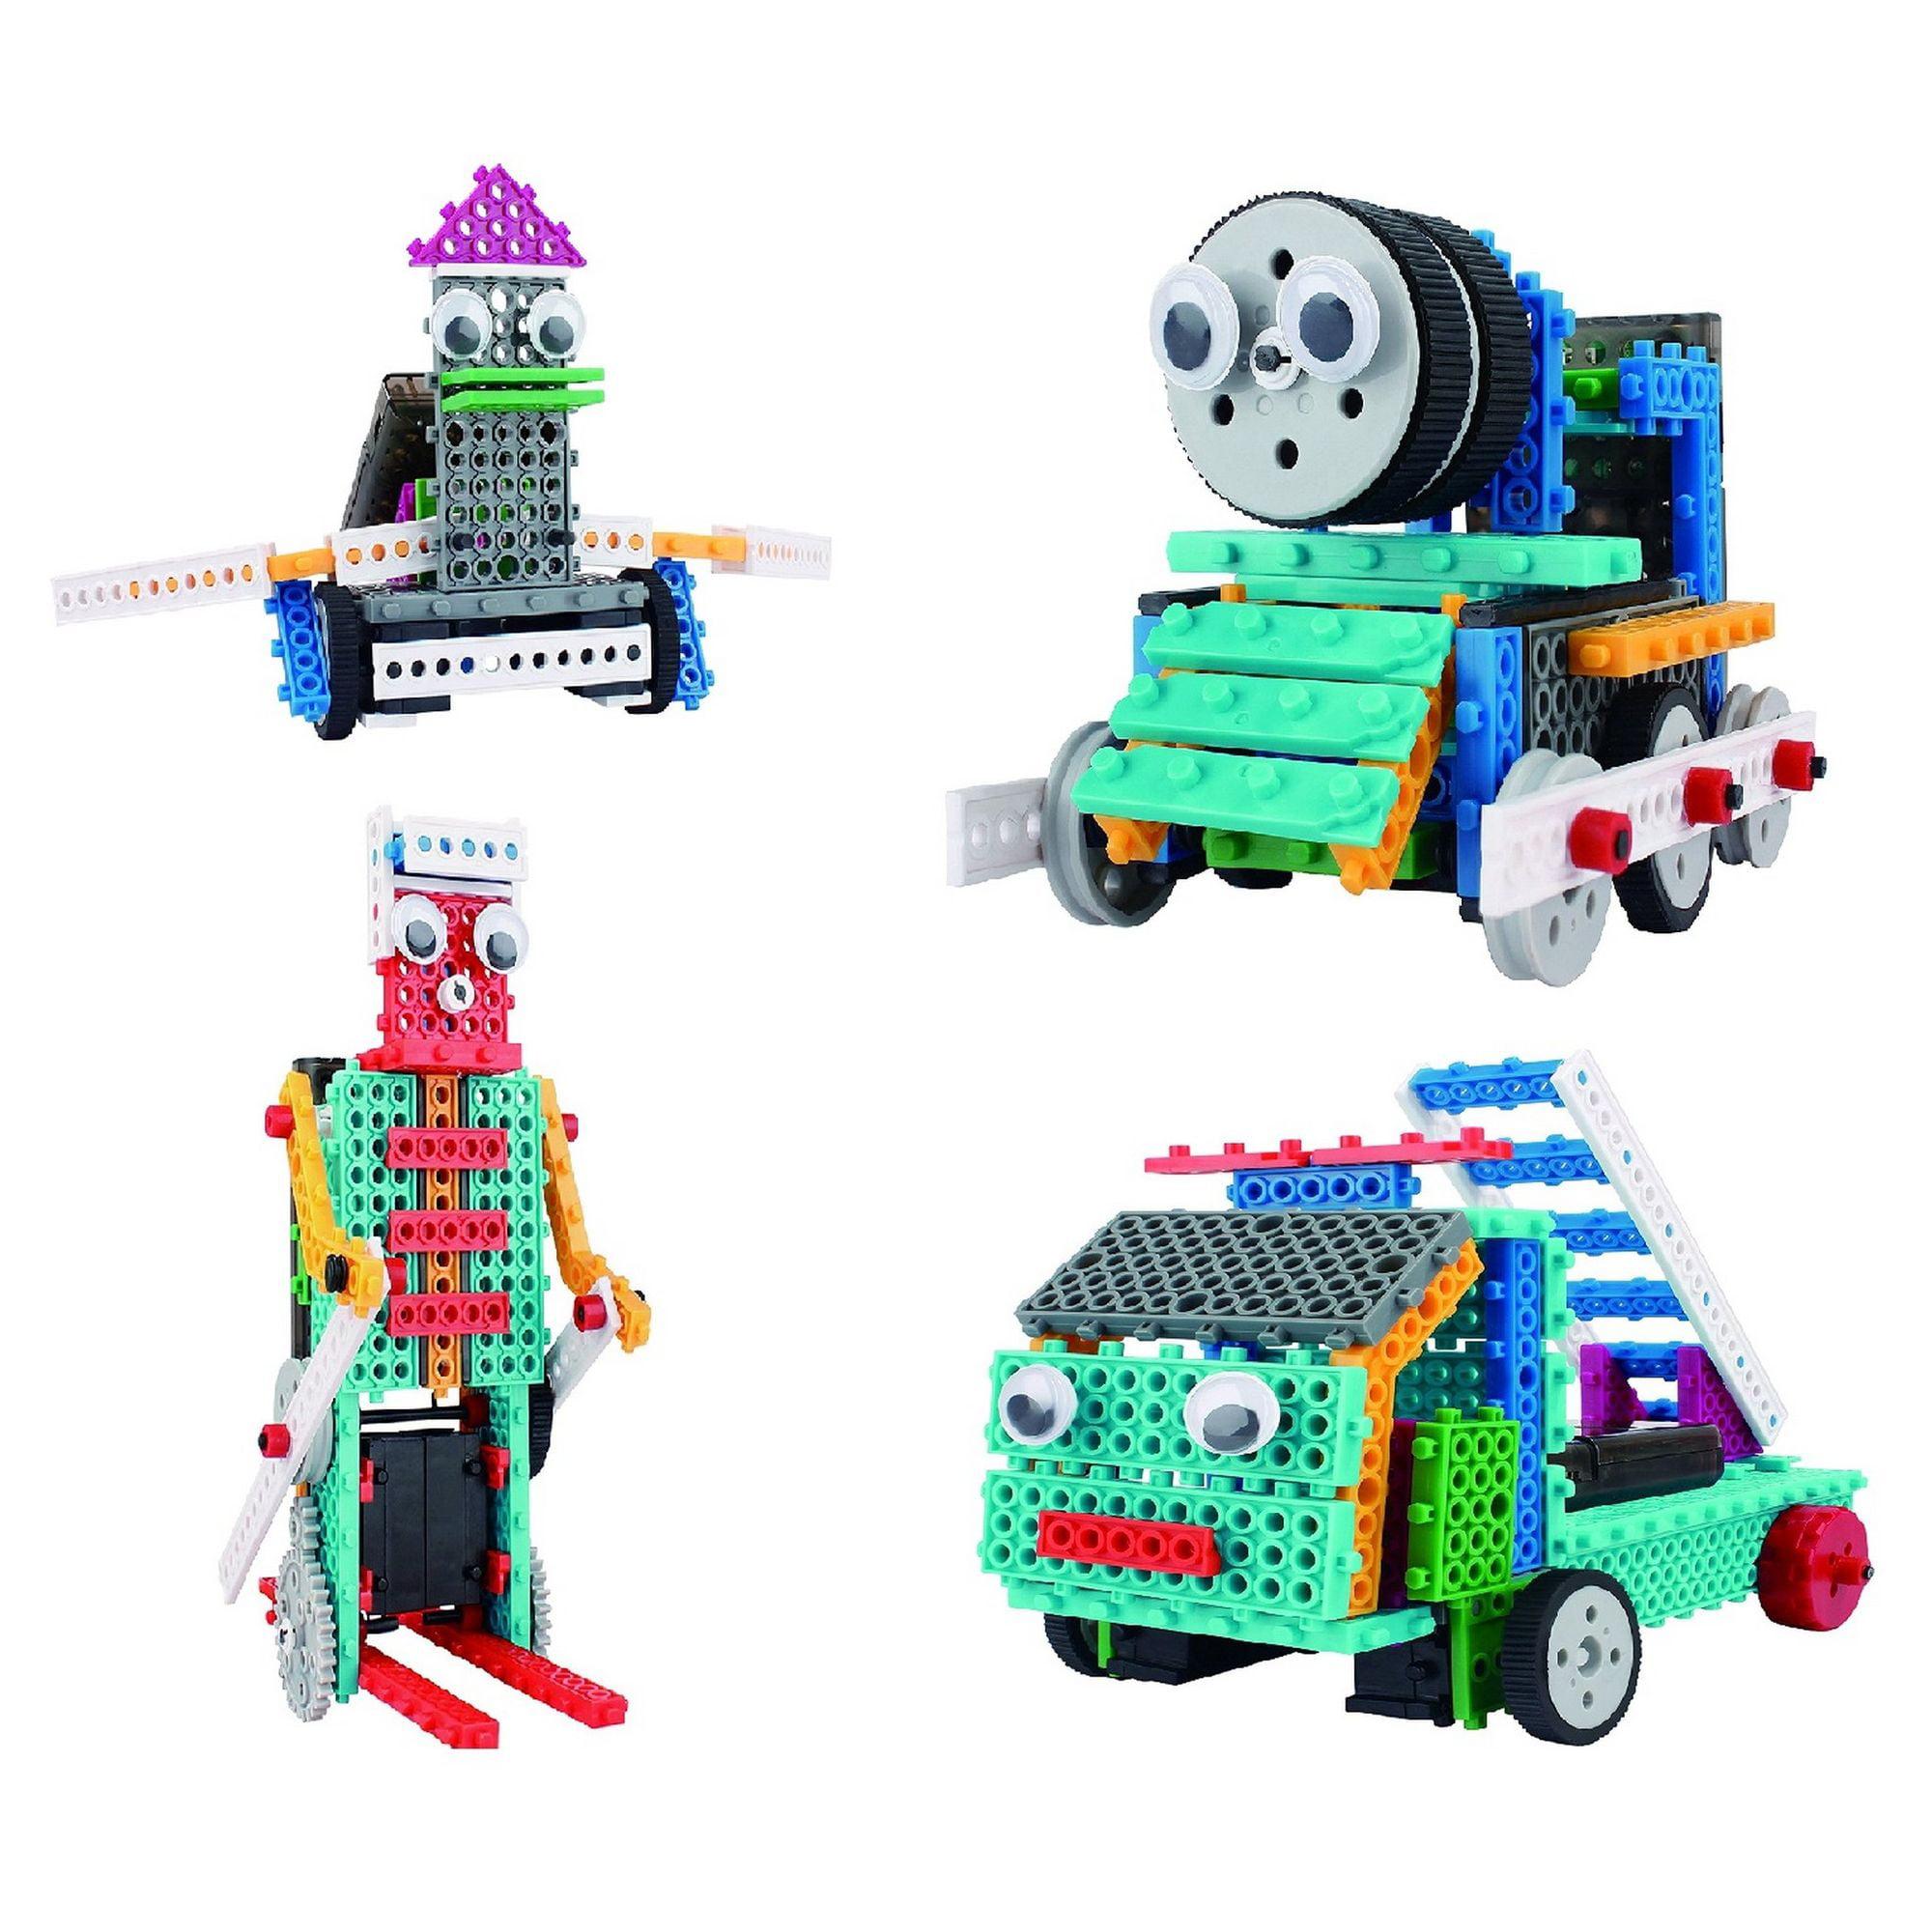 Build Your Own Remote Control Robot Toy - 370pcs -Robot Kit